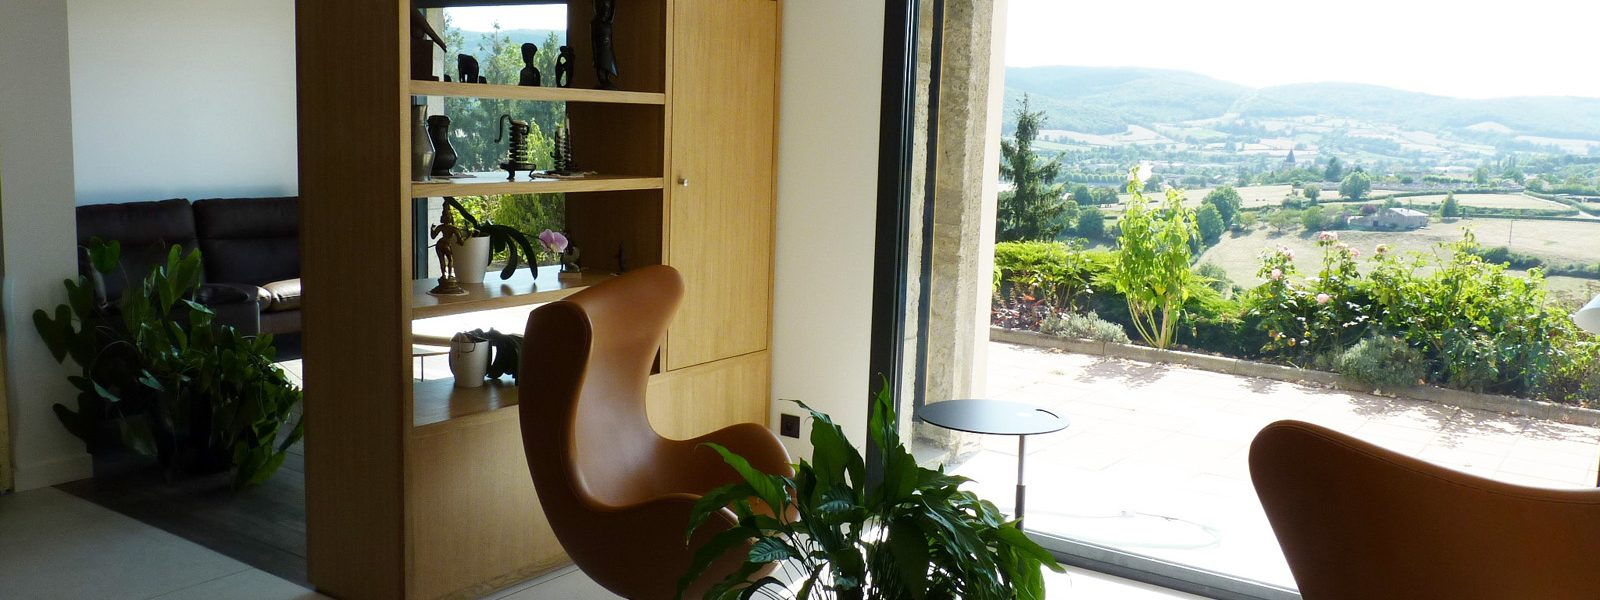 Bruno Bini - projet Habitat